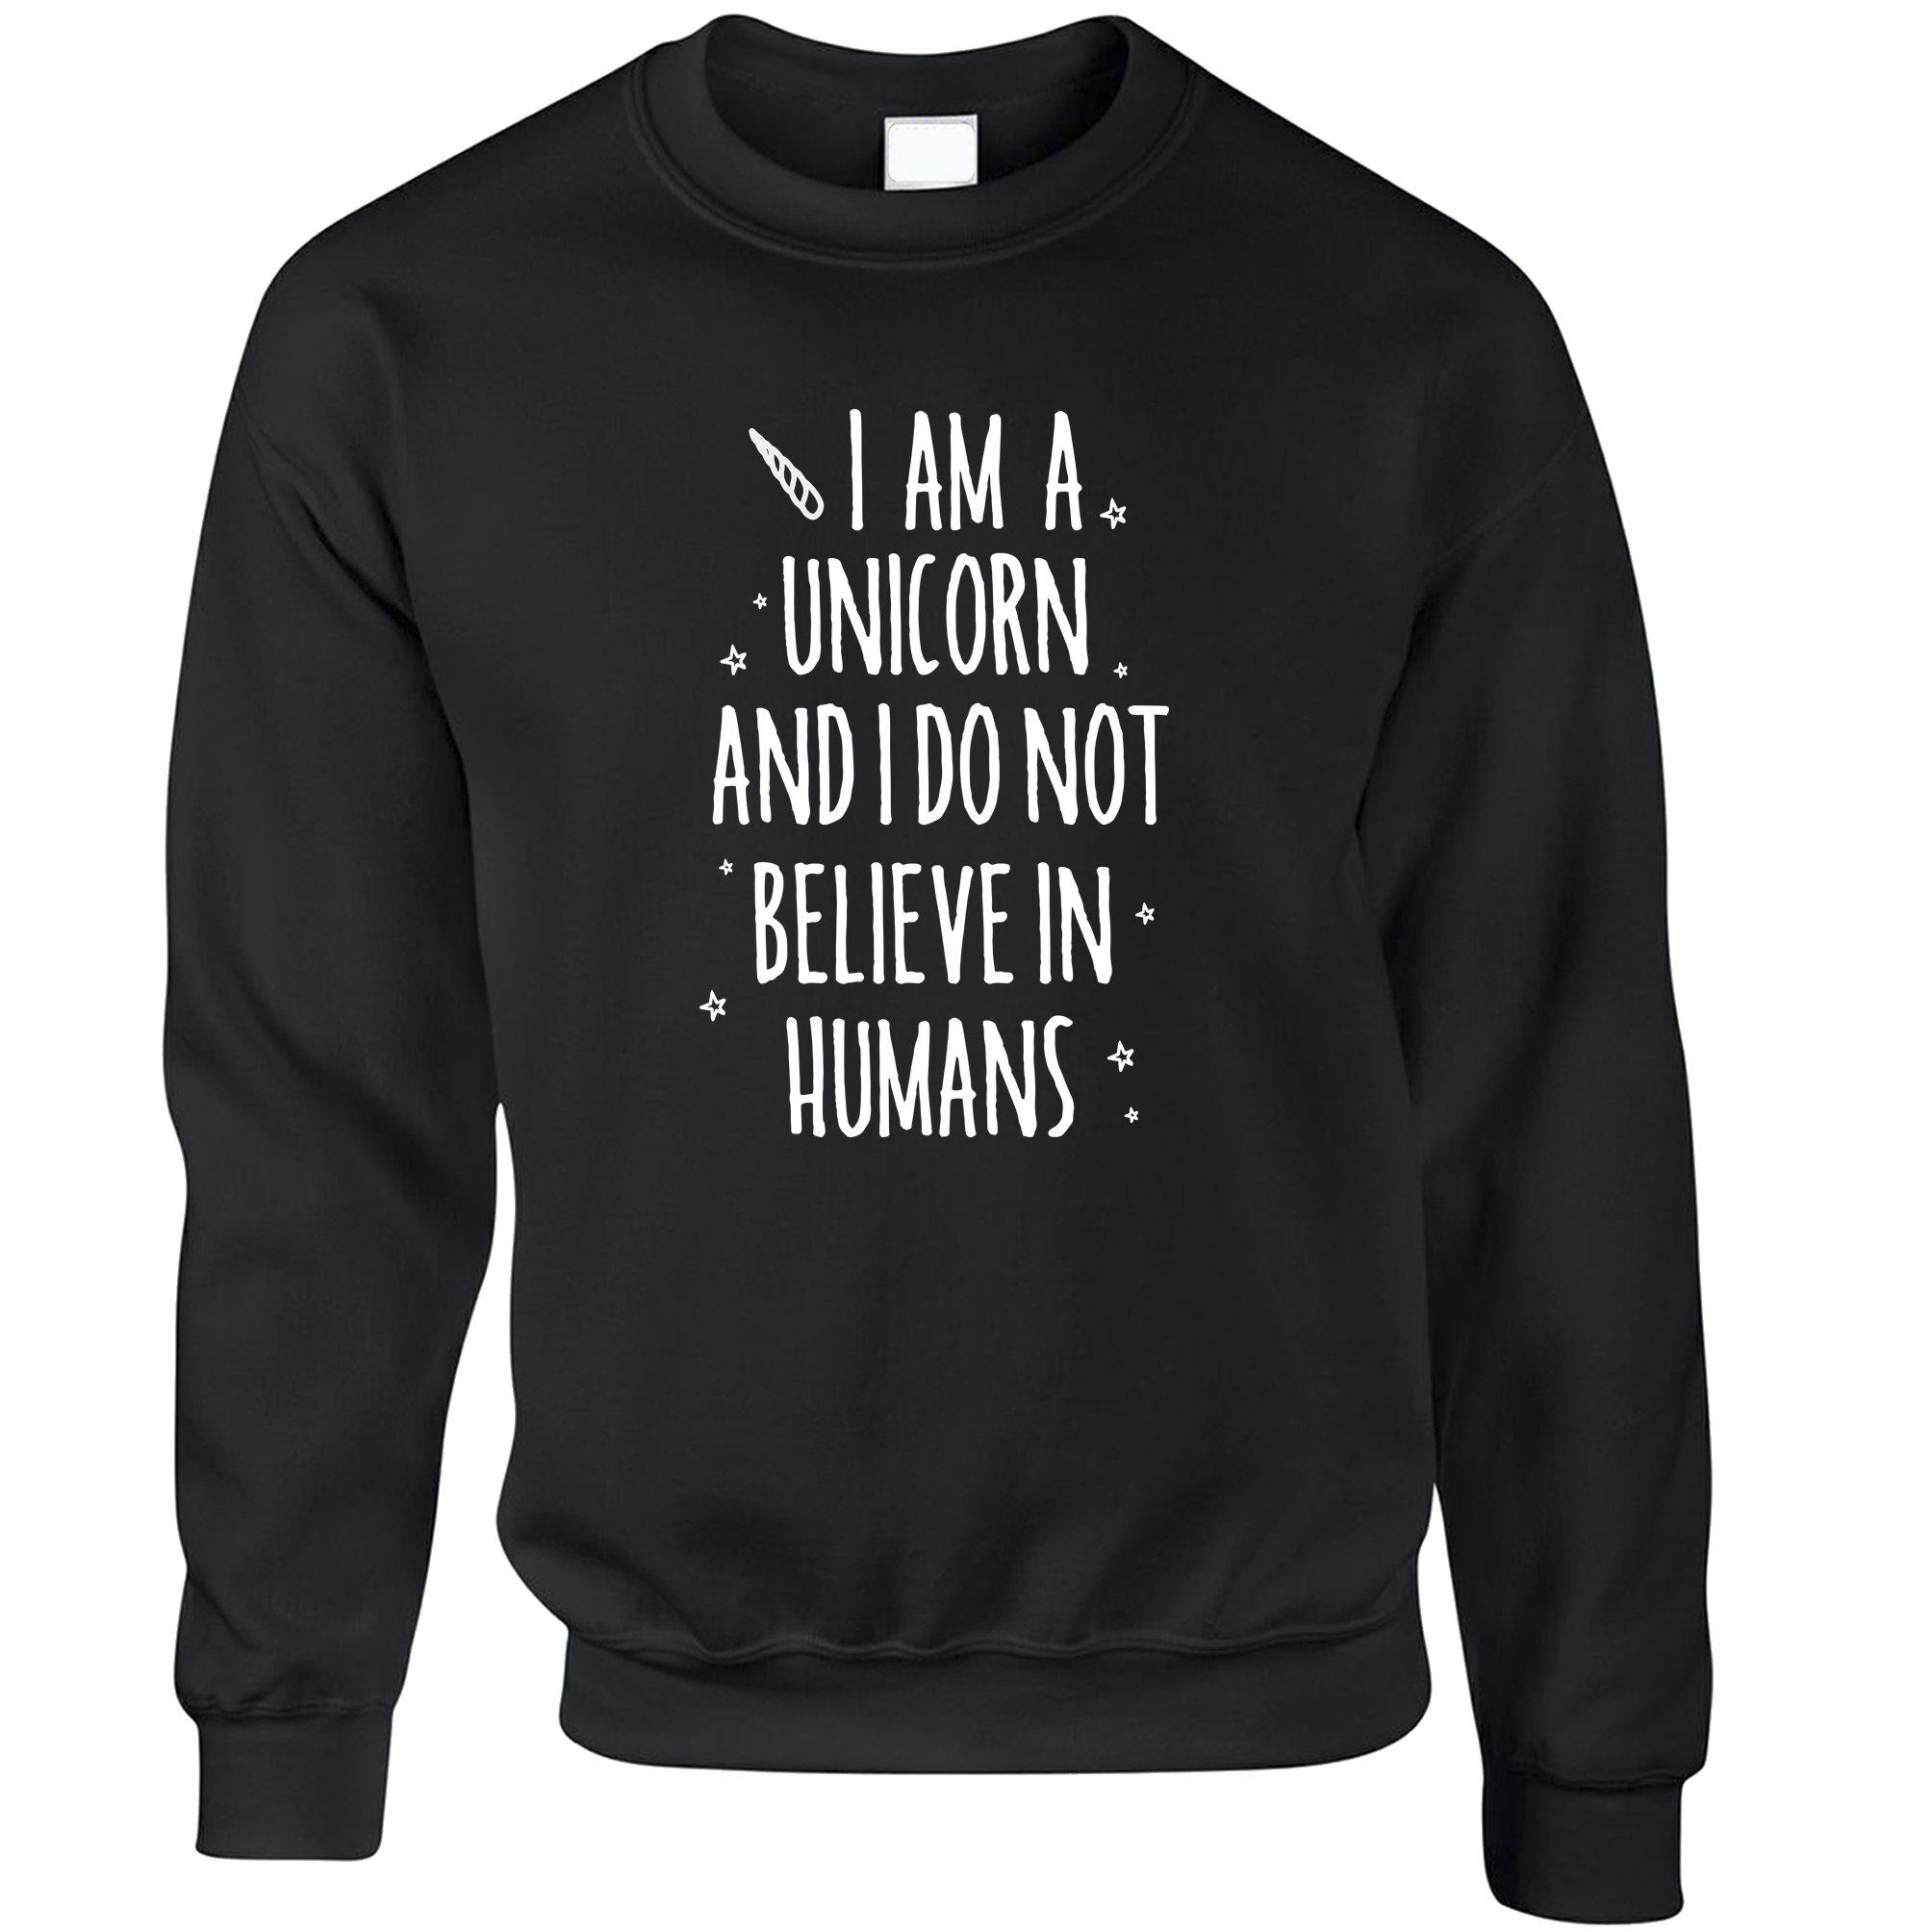 I-Am-A-Unicorn-And-i-Don-039-t-Believe-In-Humans-Cute-Slogan-Unisex-Sweatshirt